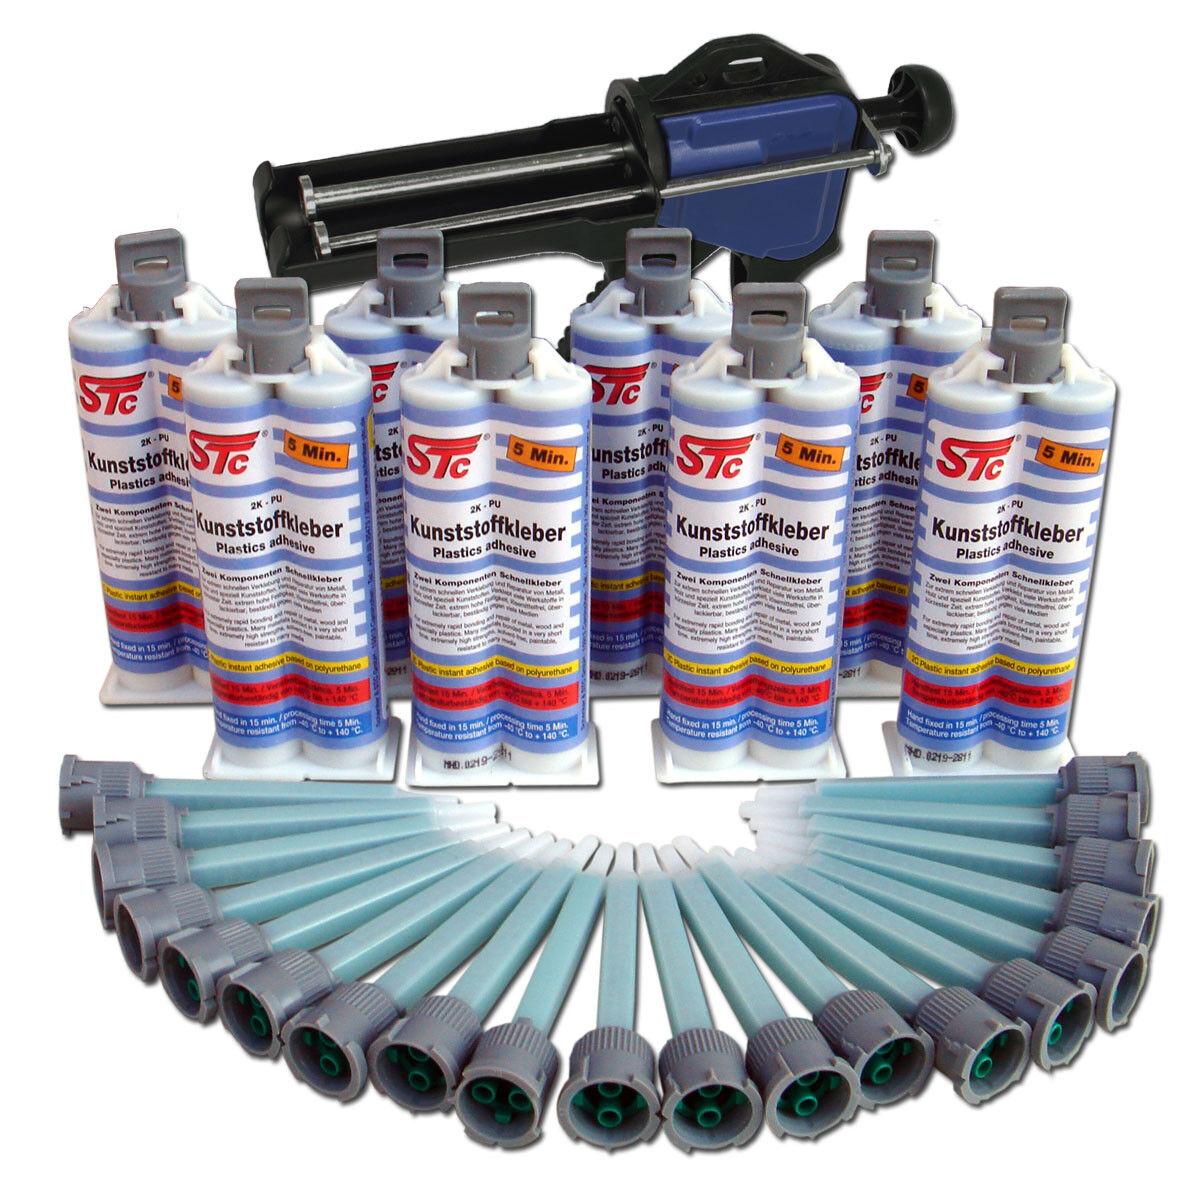 2K PU Kunststoffkleber 5 Minuten Kunststoffreperatur Set 8 x 50 g inkl. Zubehör